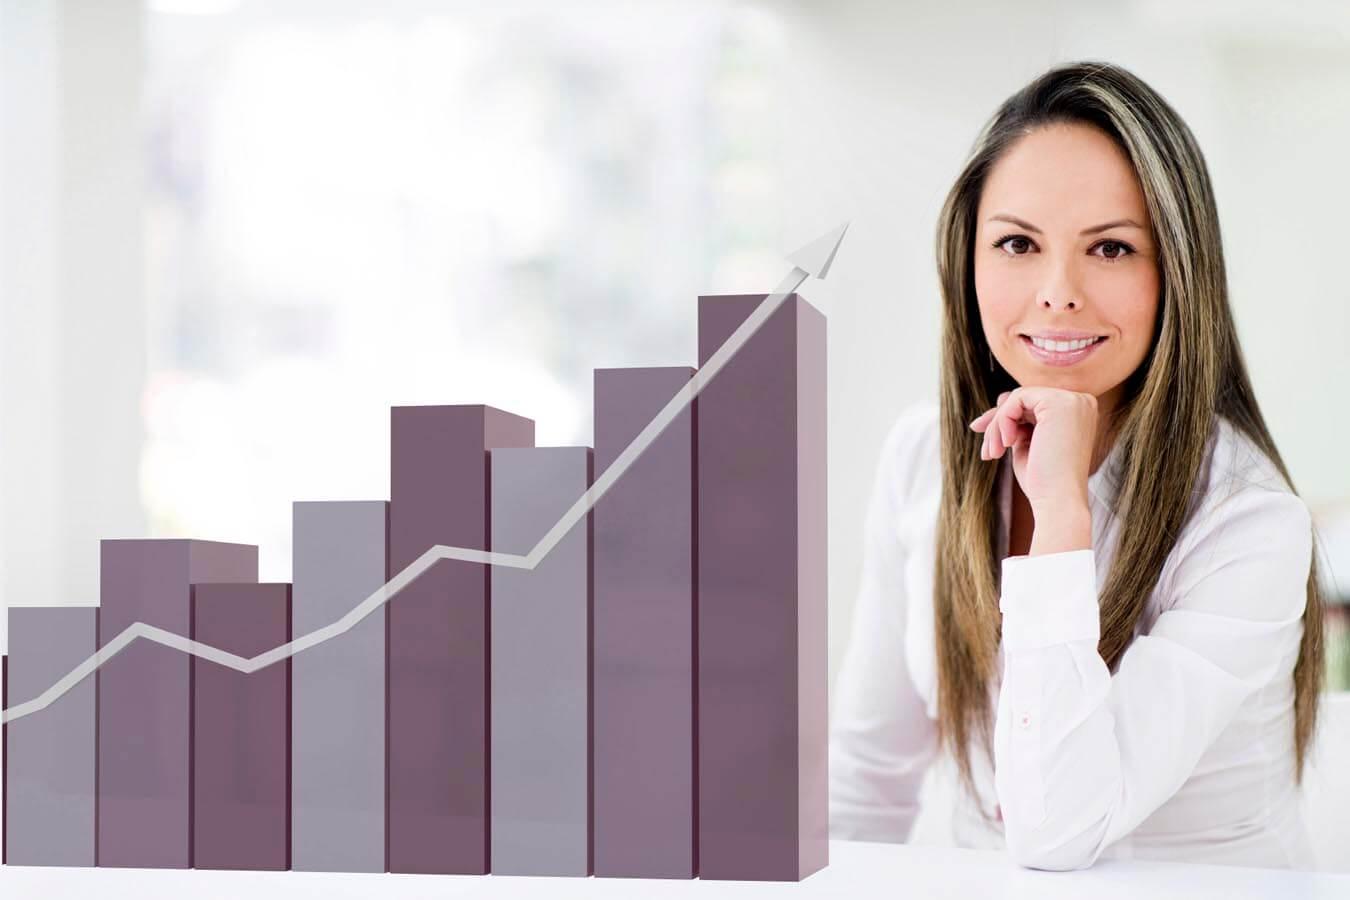 Helping Hispanic-Americans achieve financil success